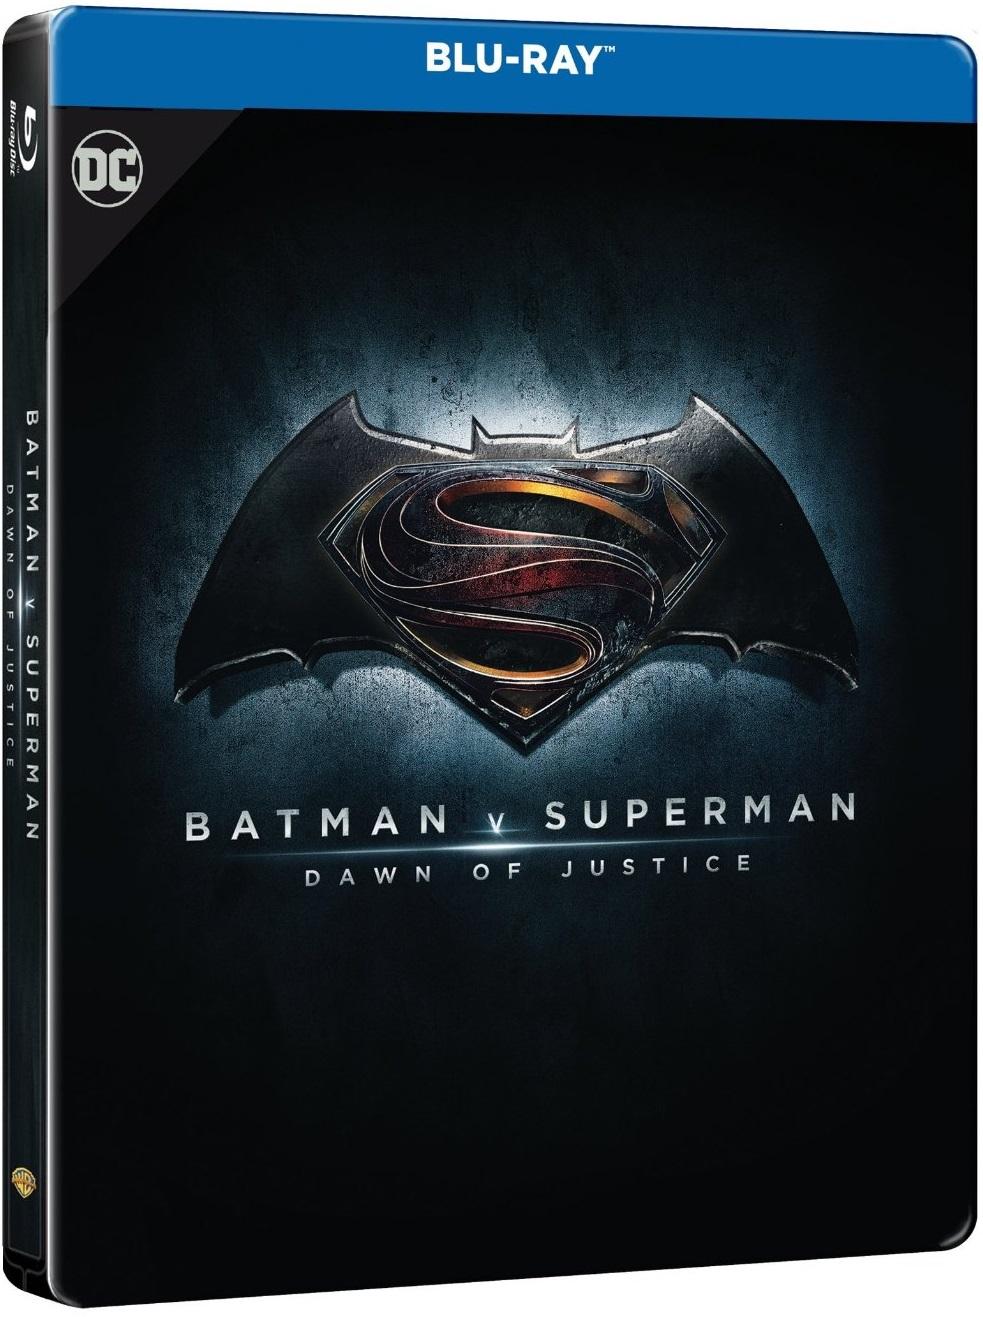 Batman Vs Superman Steelbook